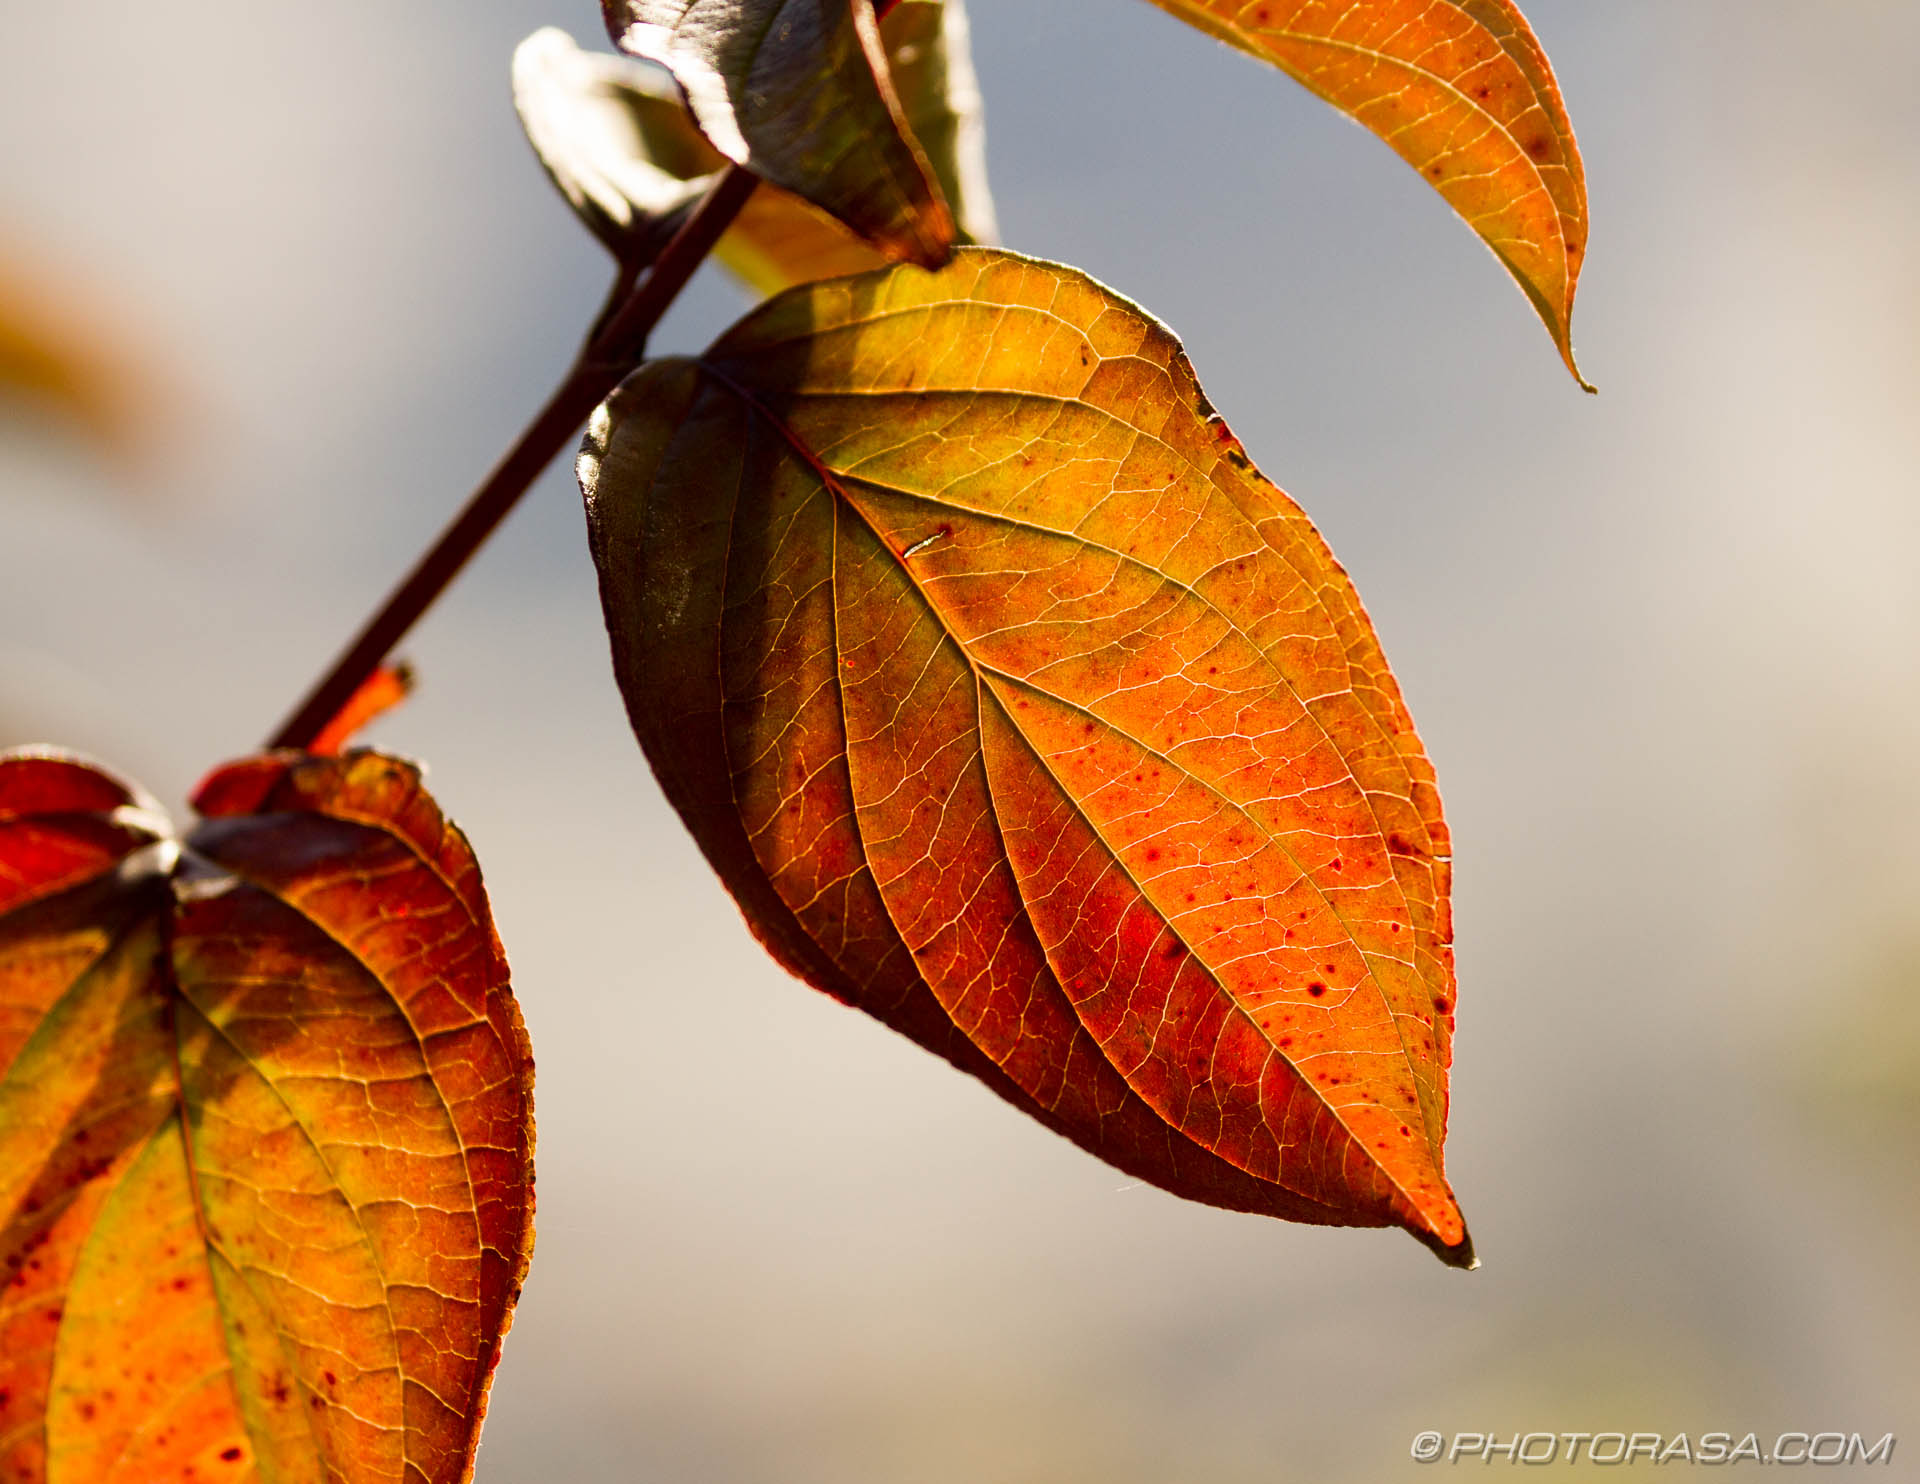 http://photorasa.com/autumn-leaves-sunlight/leaves-showing-autumns-glow/